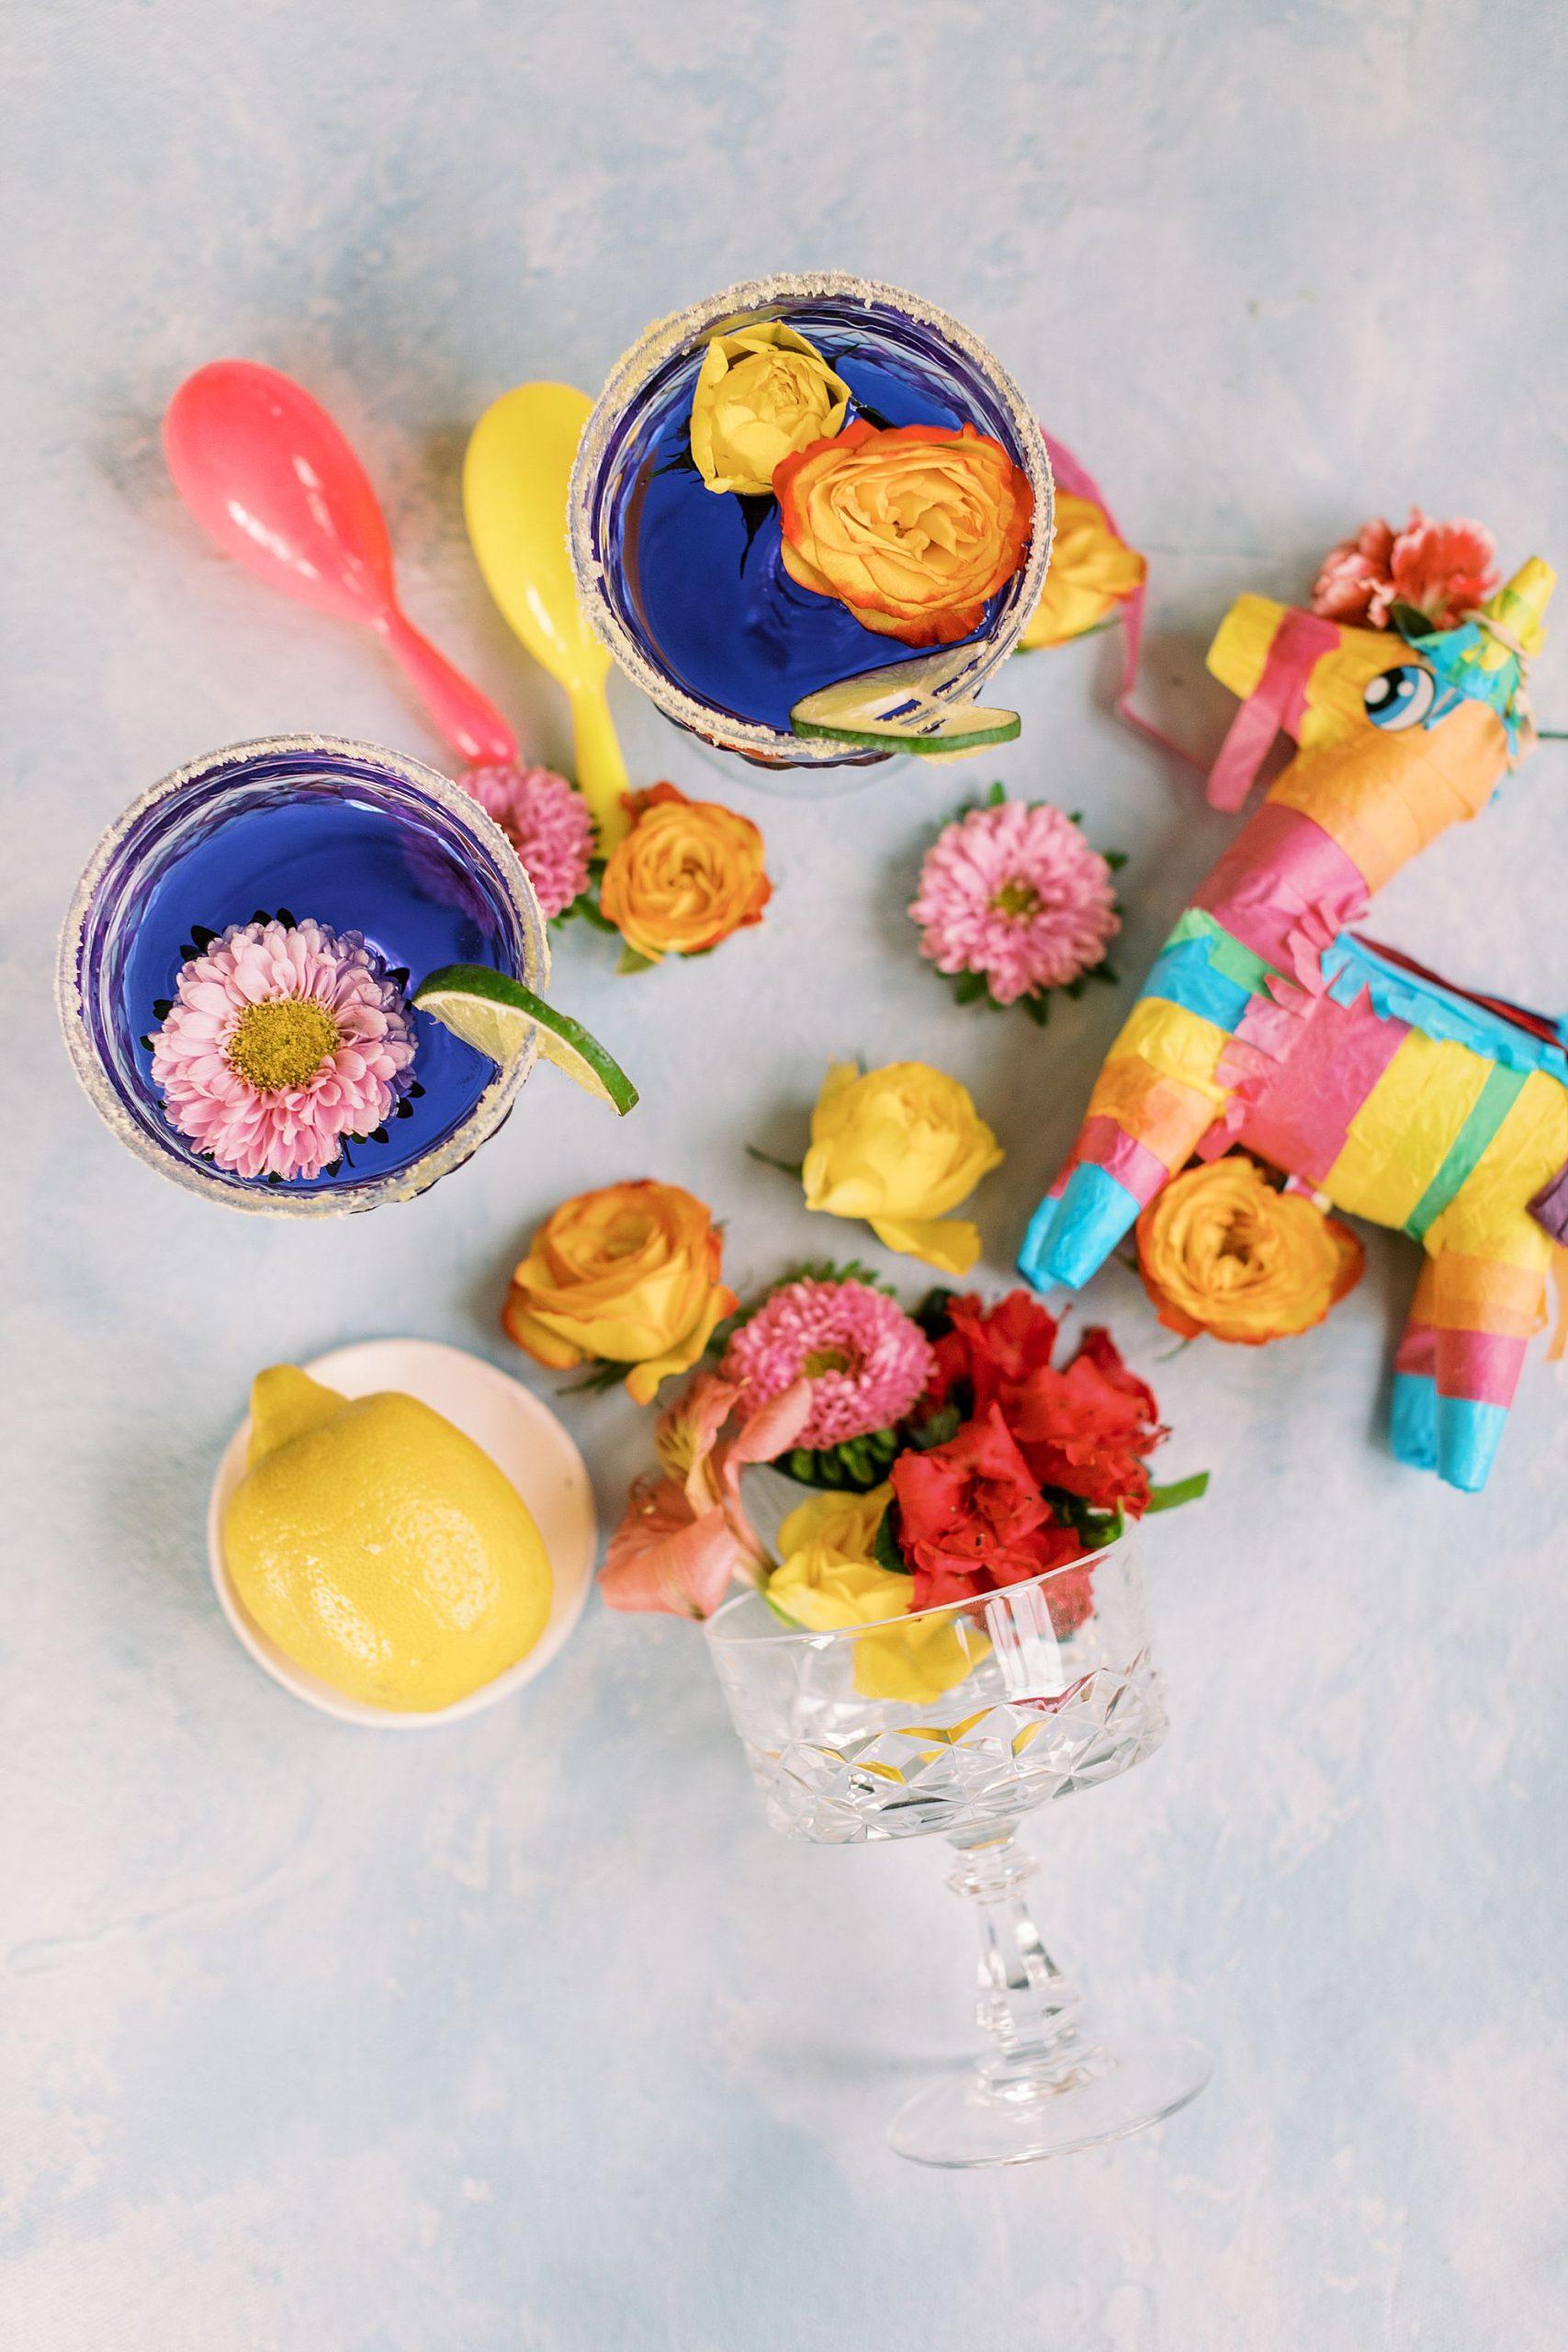 Cinco De Mayo Inspiration for Your FIesta - Party Crush Studio and Ashley Baumgartner_0063.jpg